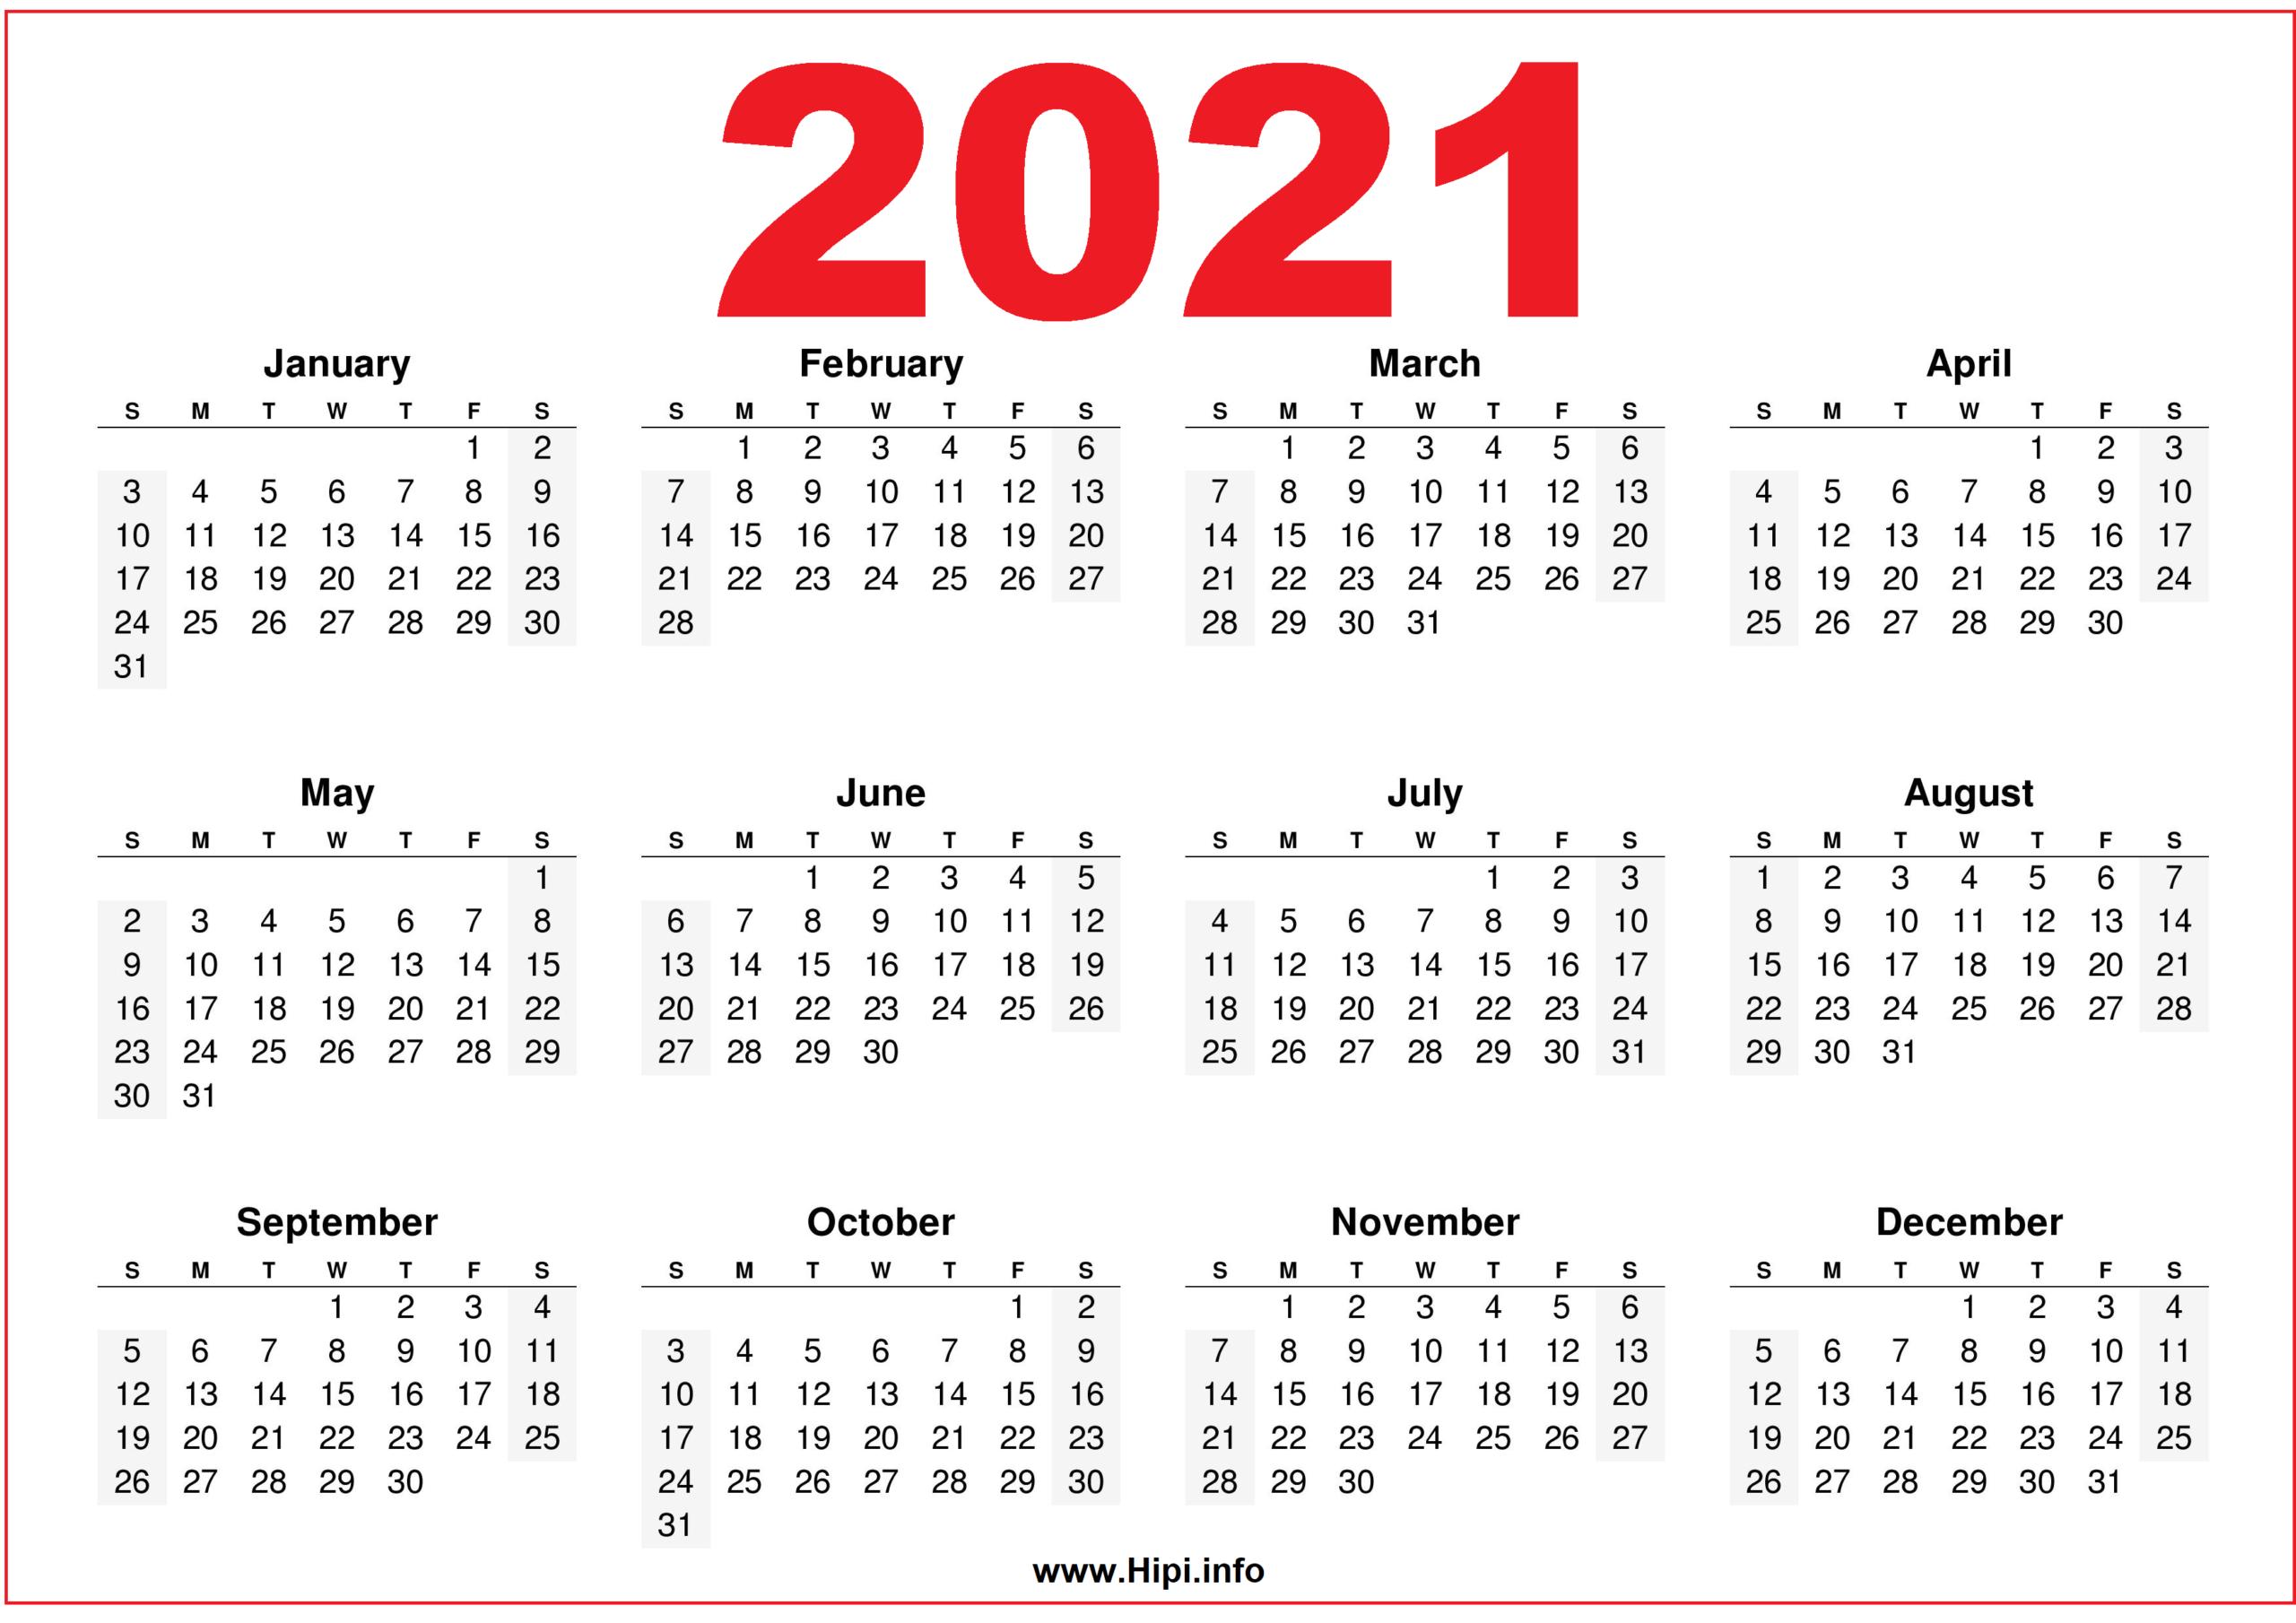 Free Printable Downloadable 2021 Calendars - Hipi  Free 2021 Calendar Printable